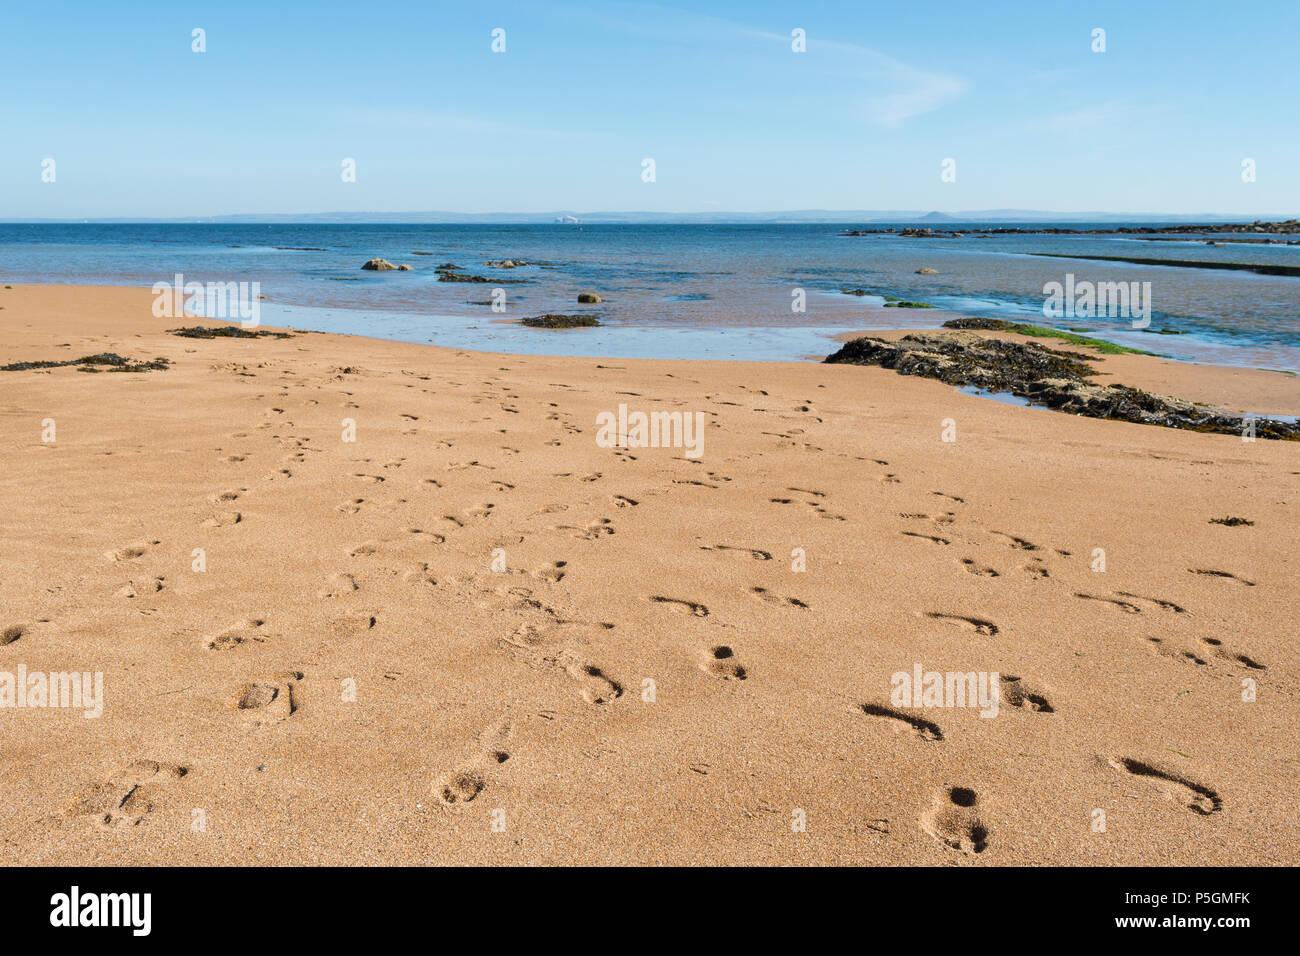 lots of footprints on a Scottish beach  - Anstruther beach, Fife, Scotland, UK - Stock Image